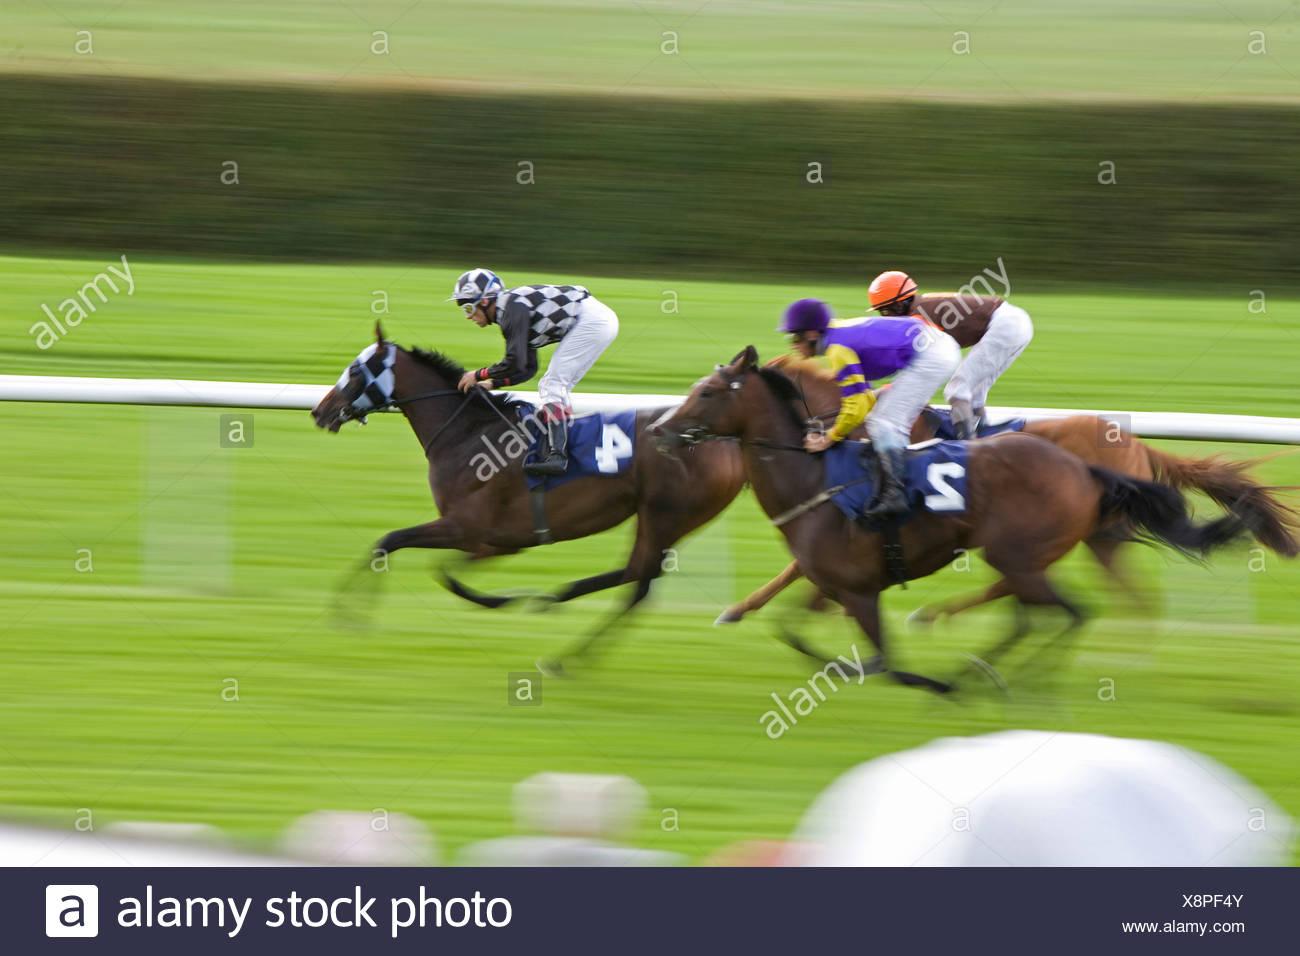 domestic horse (Equus przewalskii f. caballus), horse racing - Stock Image